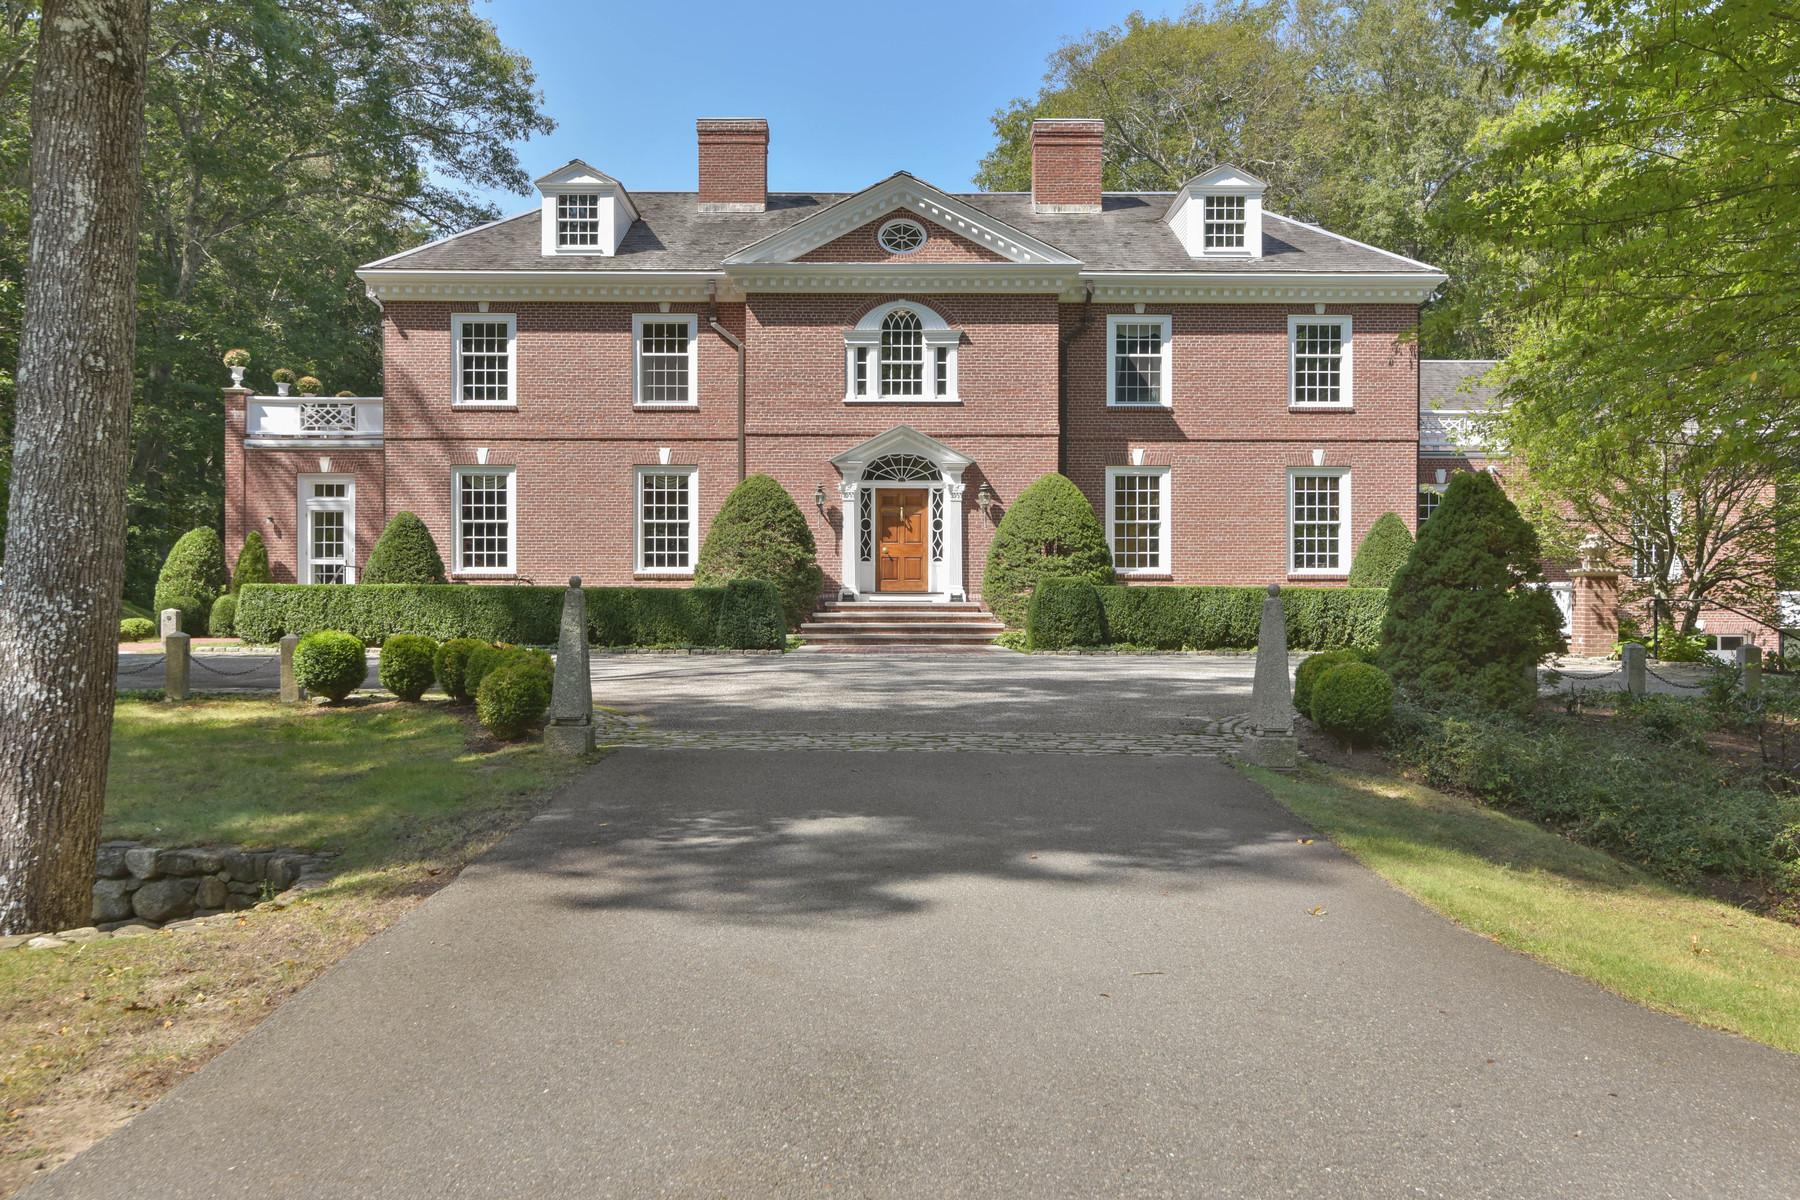 Single Family Homes για την Πώληση στο Impressive Custom Built Georgian Style Brick Residence 25 Smith Street, Dover, Μασαχουσετη 02030 Ηνωμένες Πολιτείες